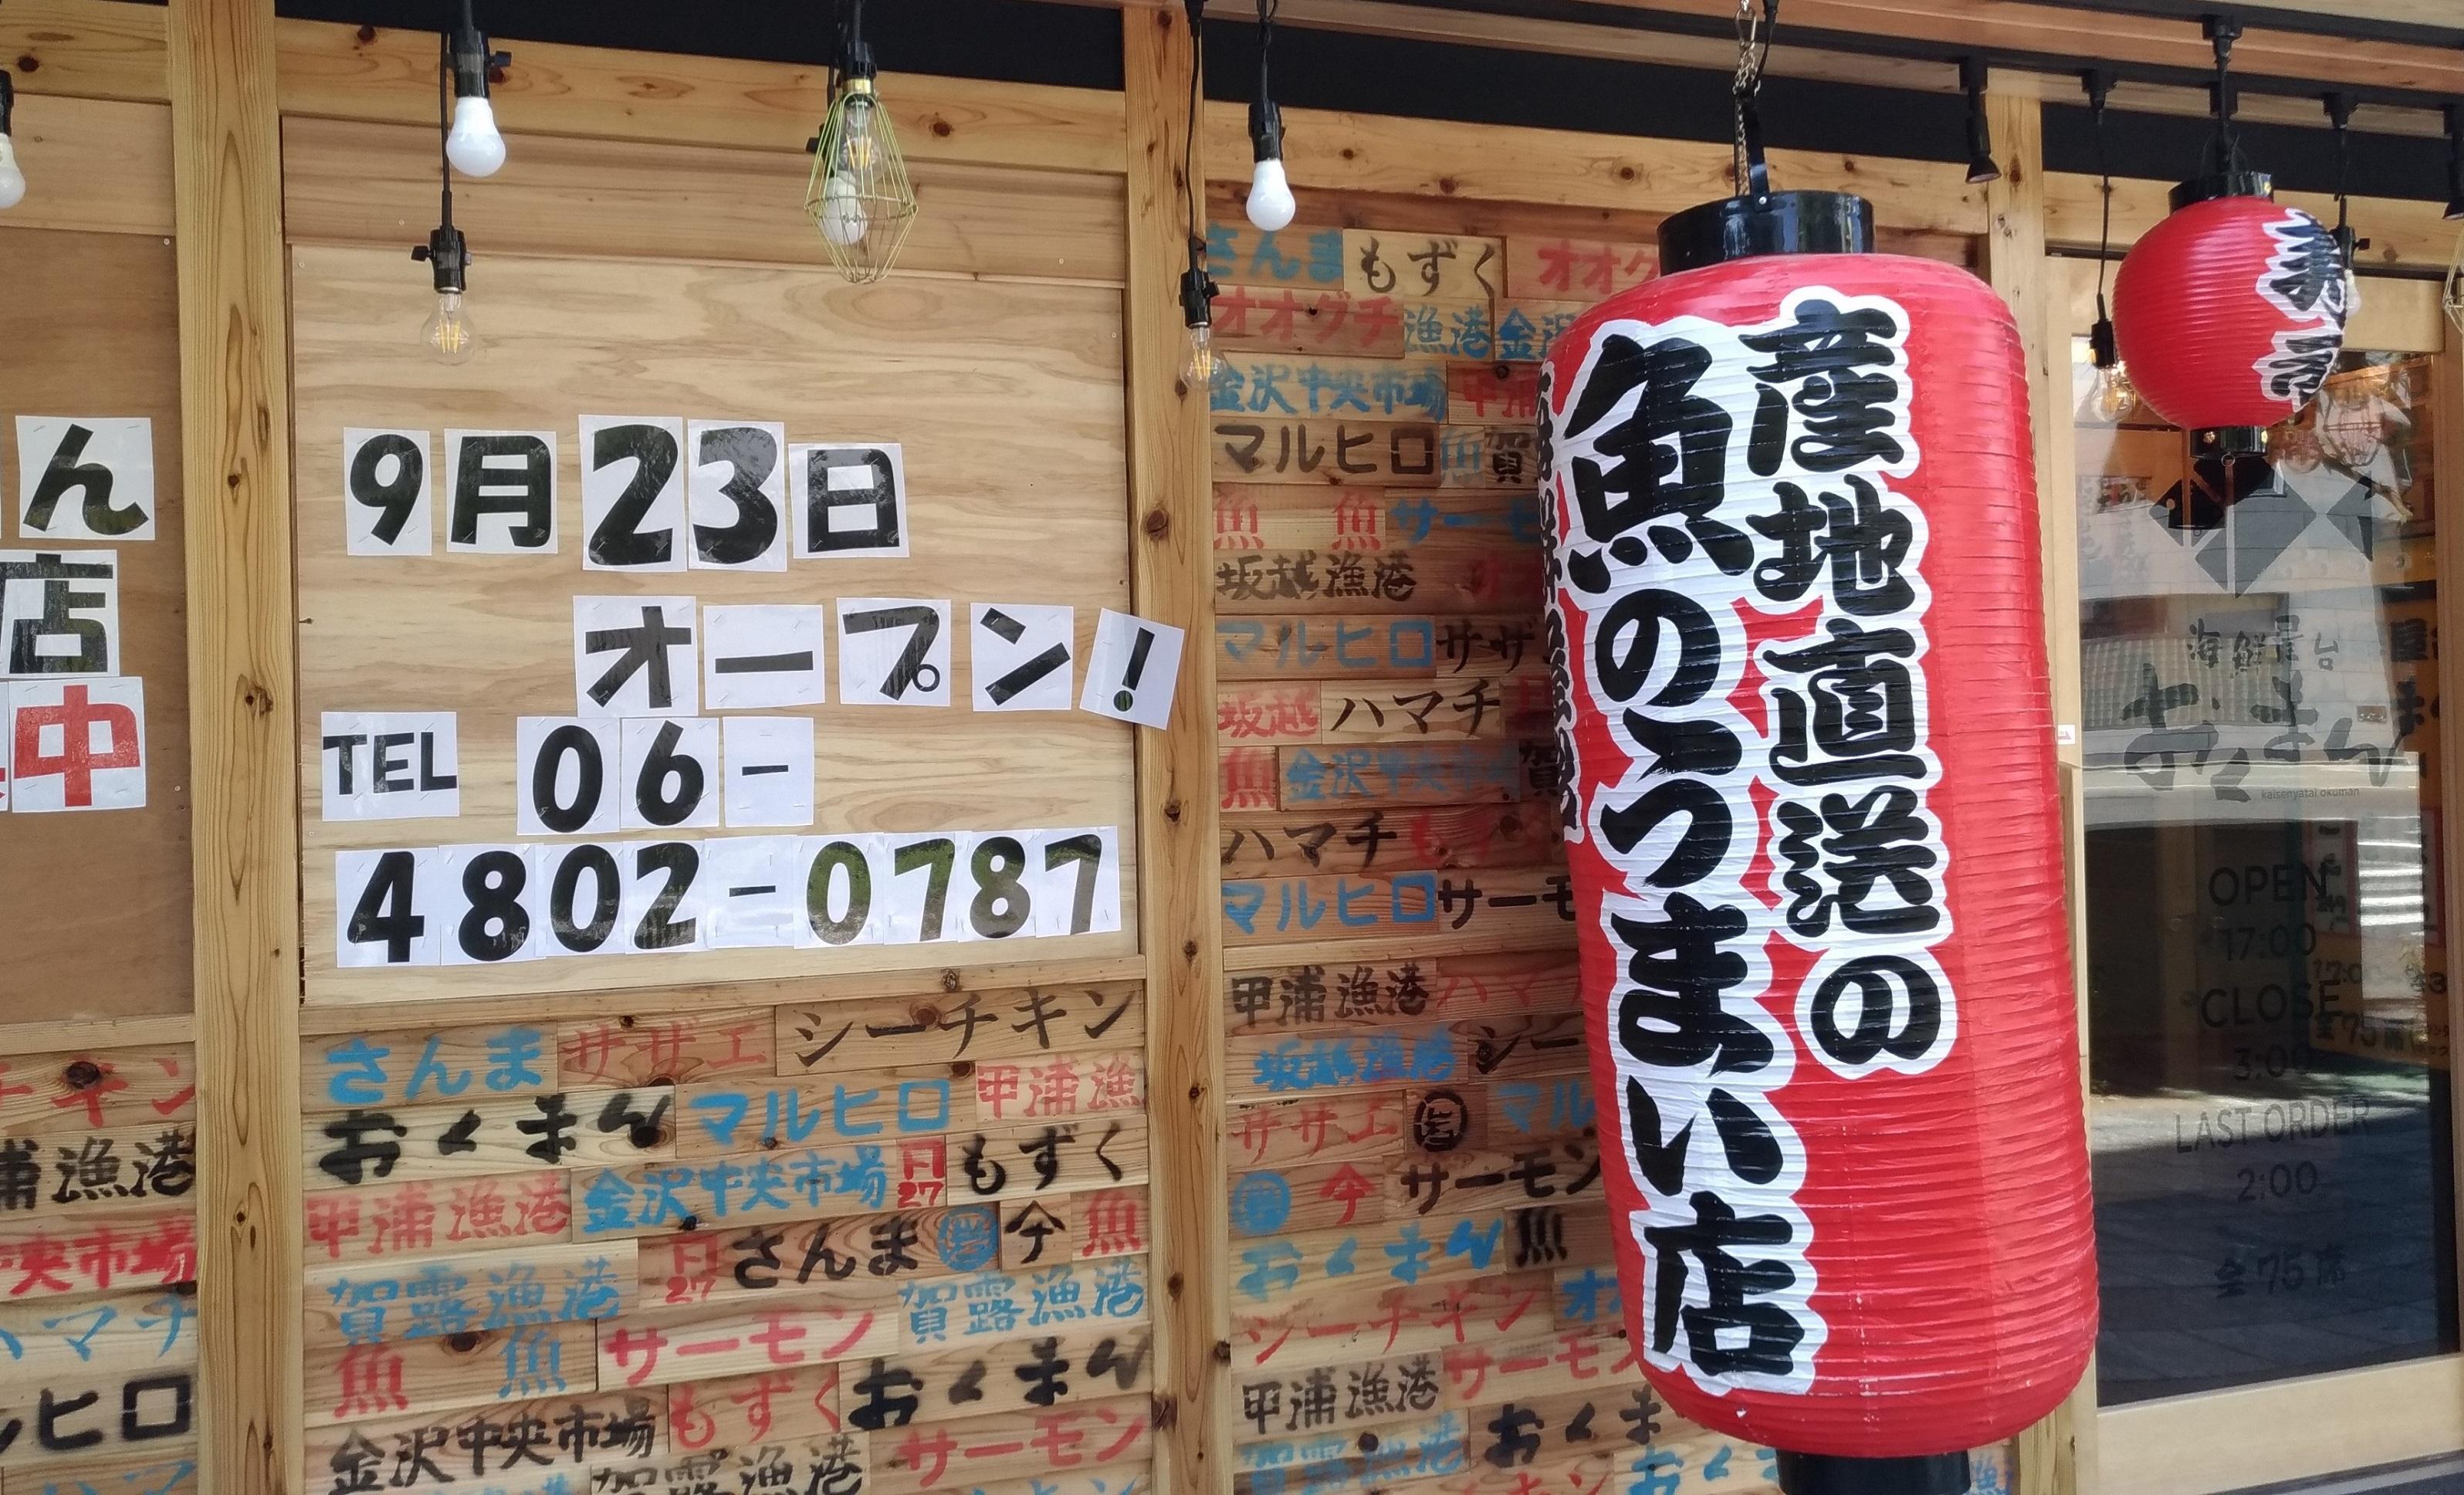 osaka_fukushima_new_kaisen_yatai_open_2.jpg